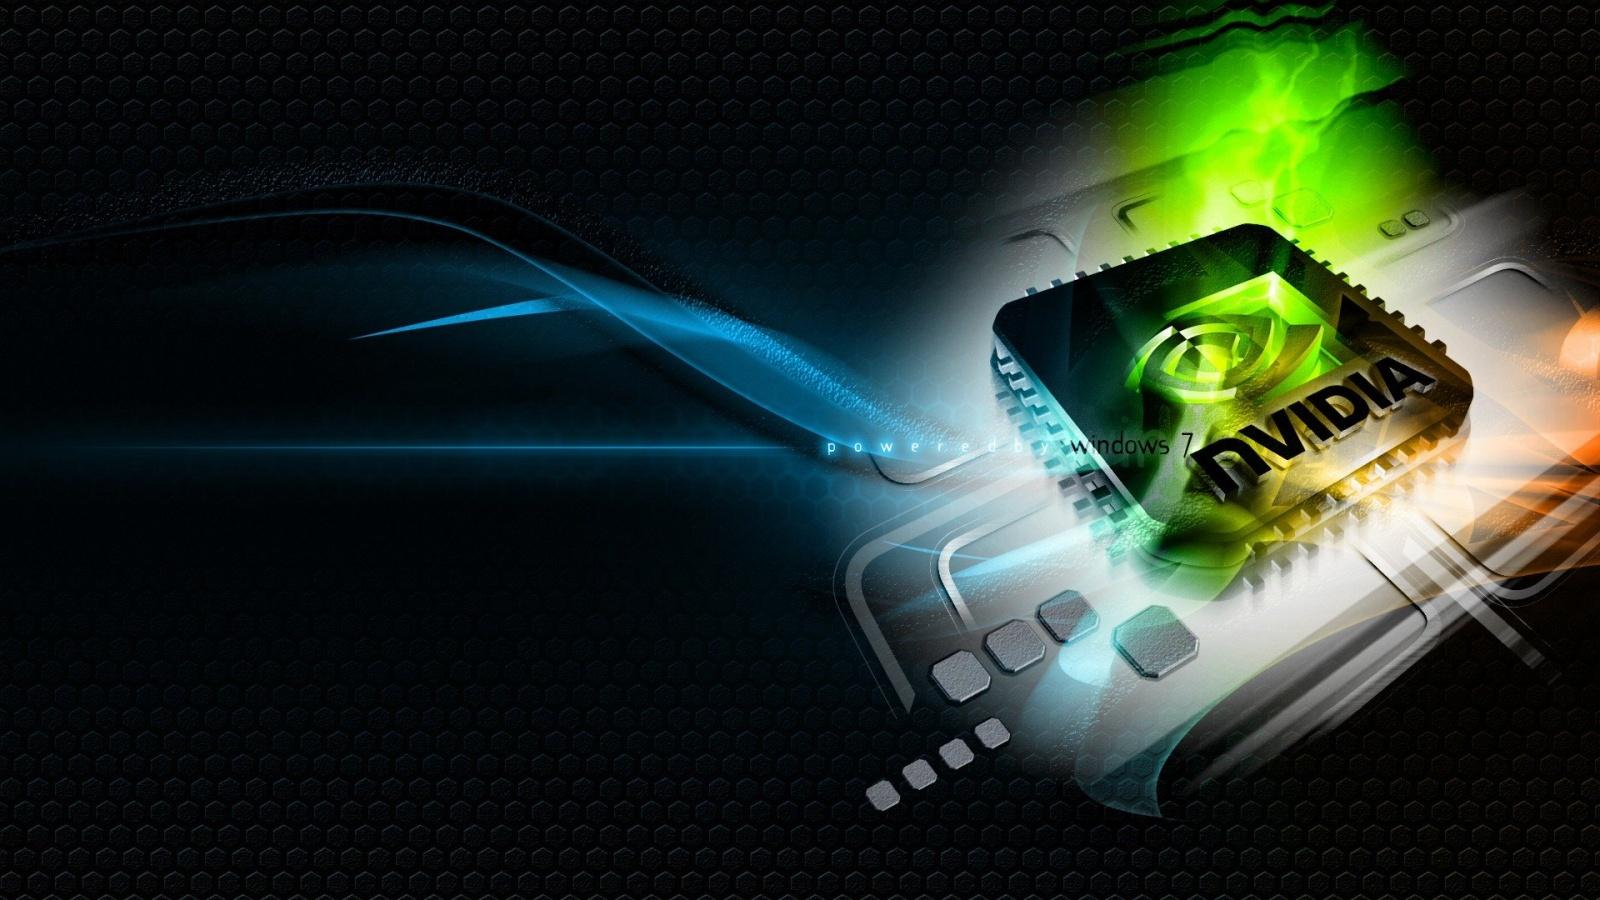 https://2.bp.blogspot.com/-UTuujUszpQ0/T4wSGPs4d-I/AAAAAAAAEig/vO89TncaIlA/s1600/windows_7_nvidia-1600x900.jpg